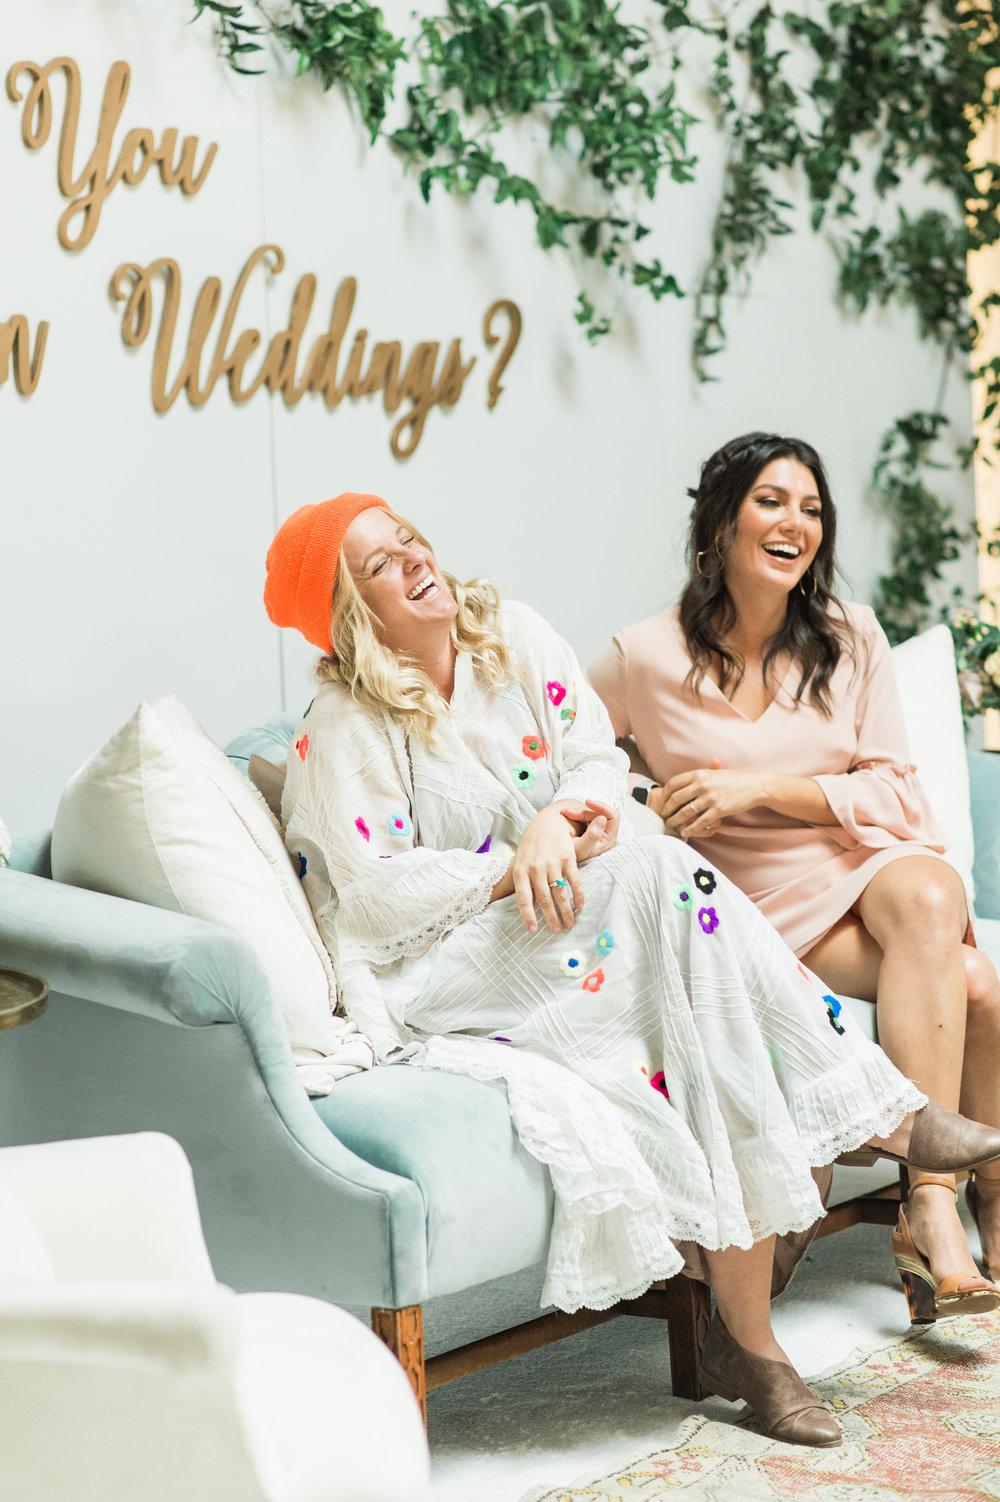 Arizona Wedding Planner LVL Academy Experience 6.jpg